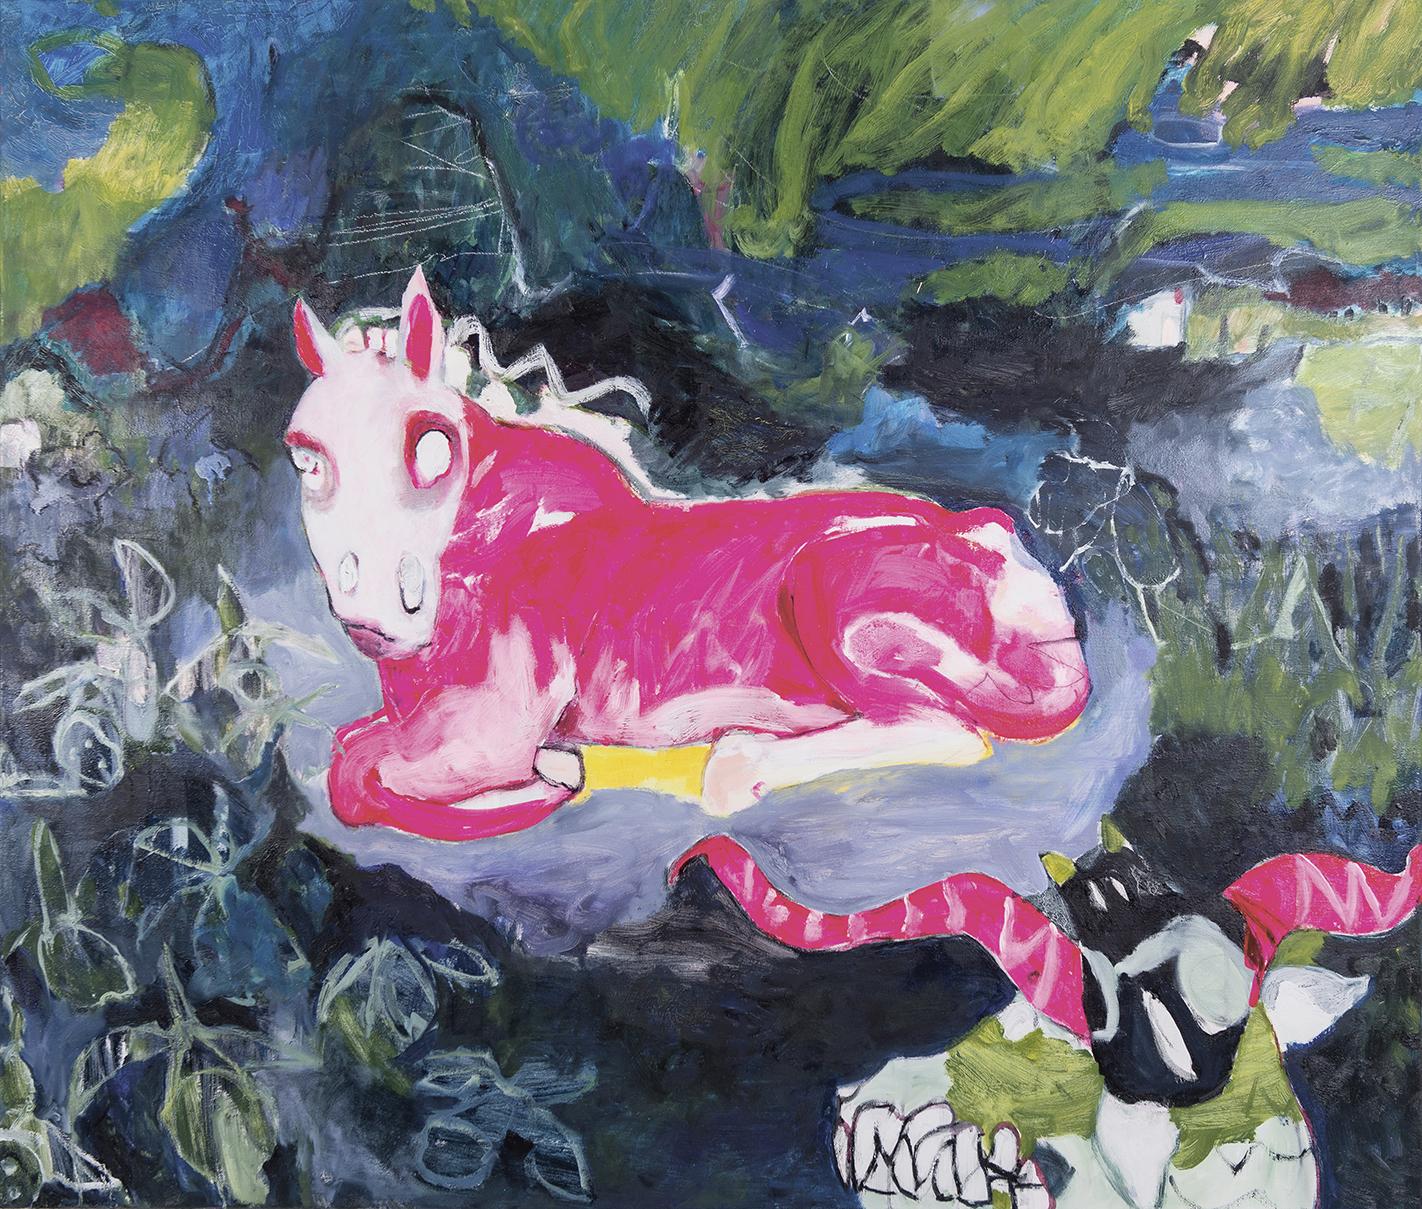 Little Pony oil on canvas 140×130 cm, 2016